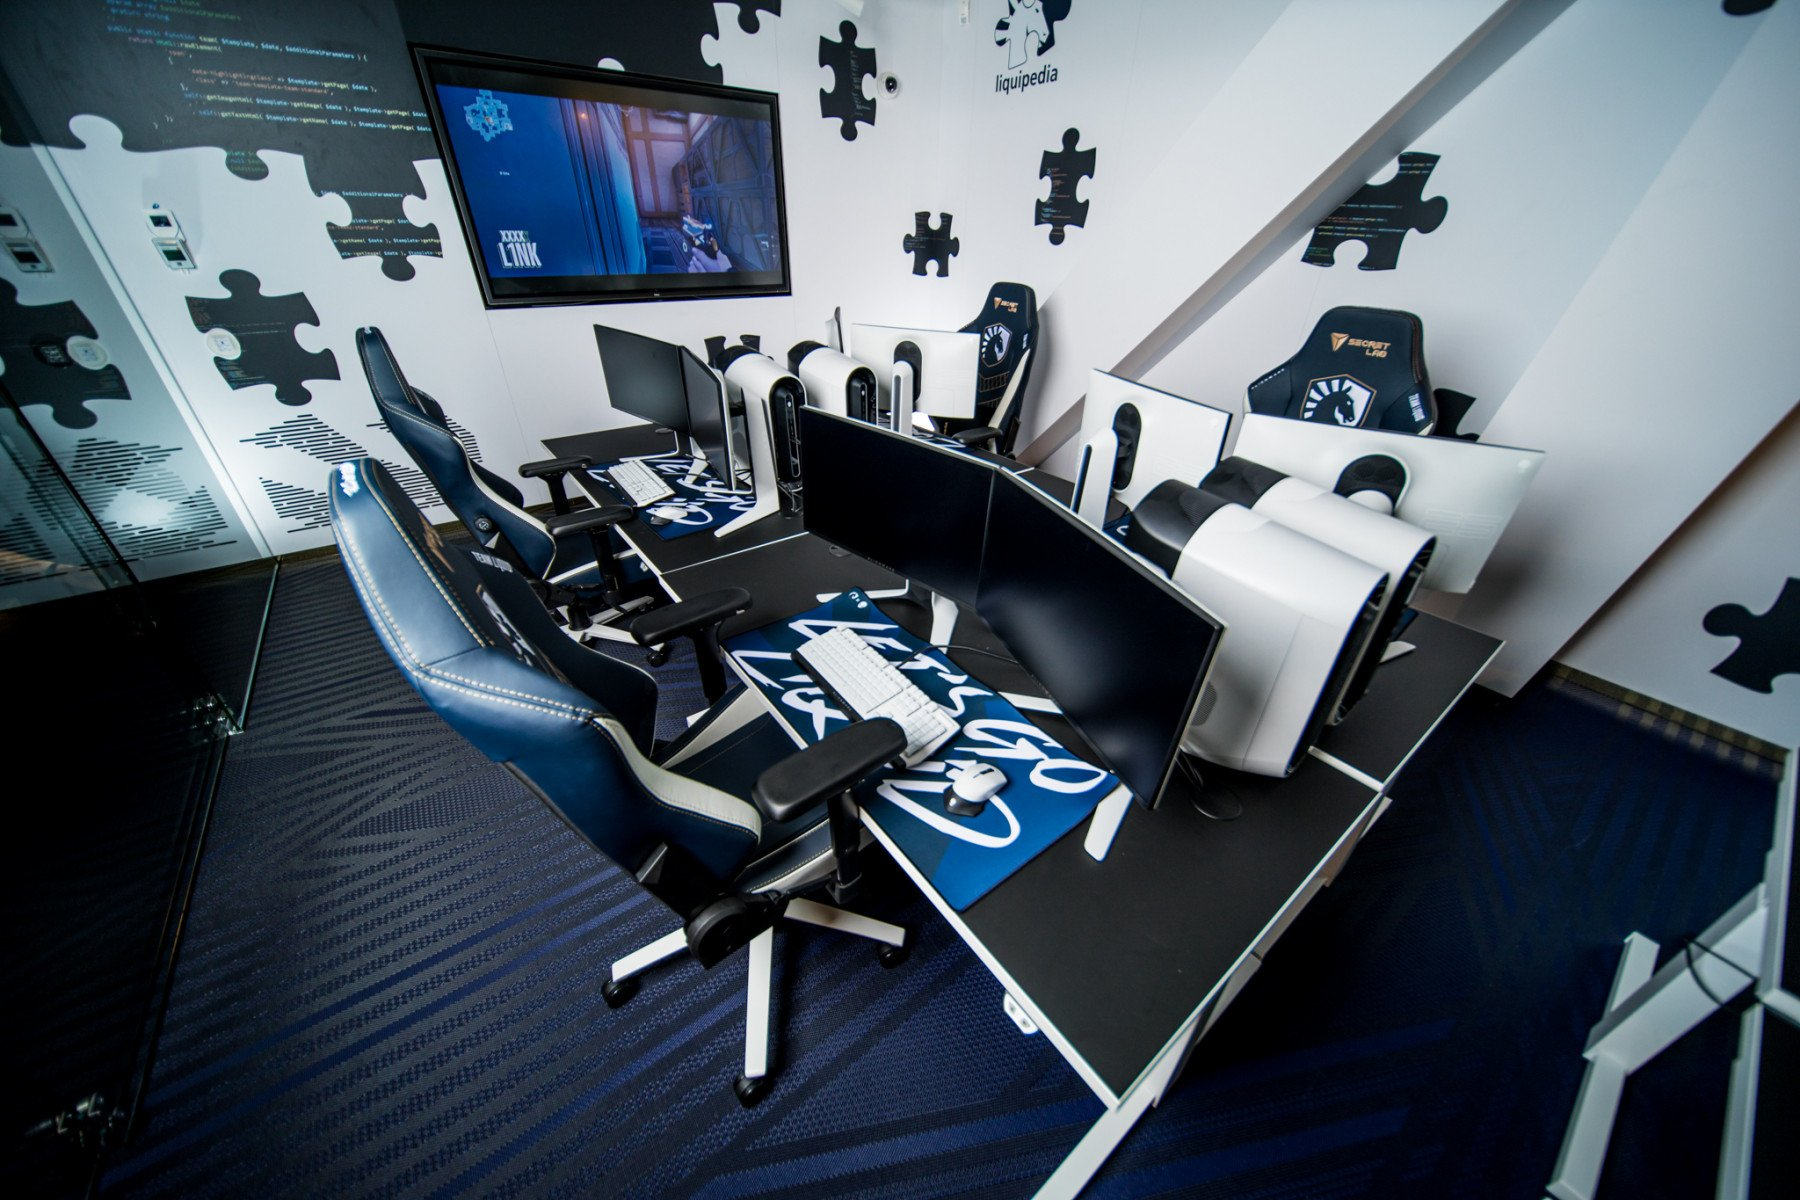 AlienWare Training Facility EU - Team Liquid Liquidpedia workspace